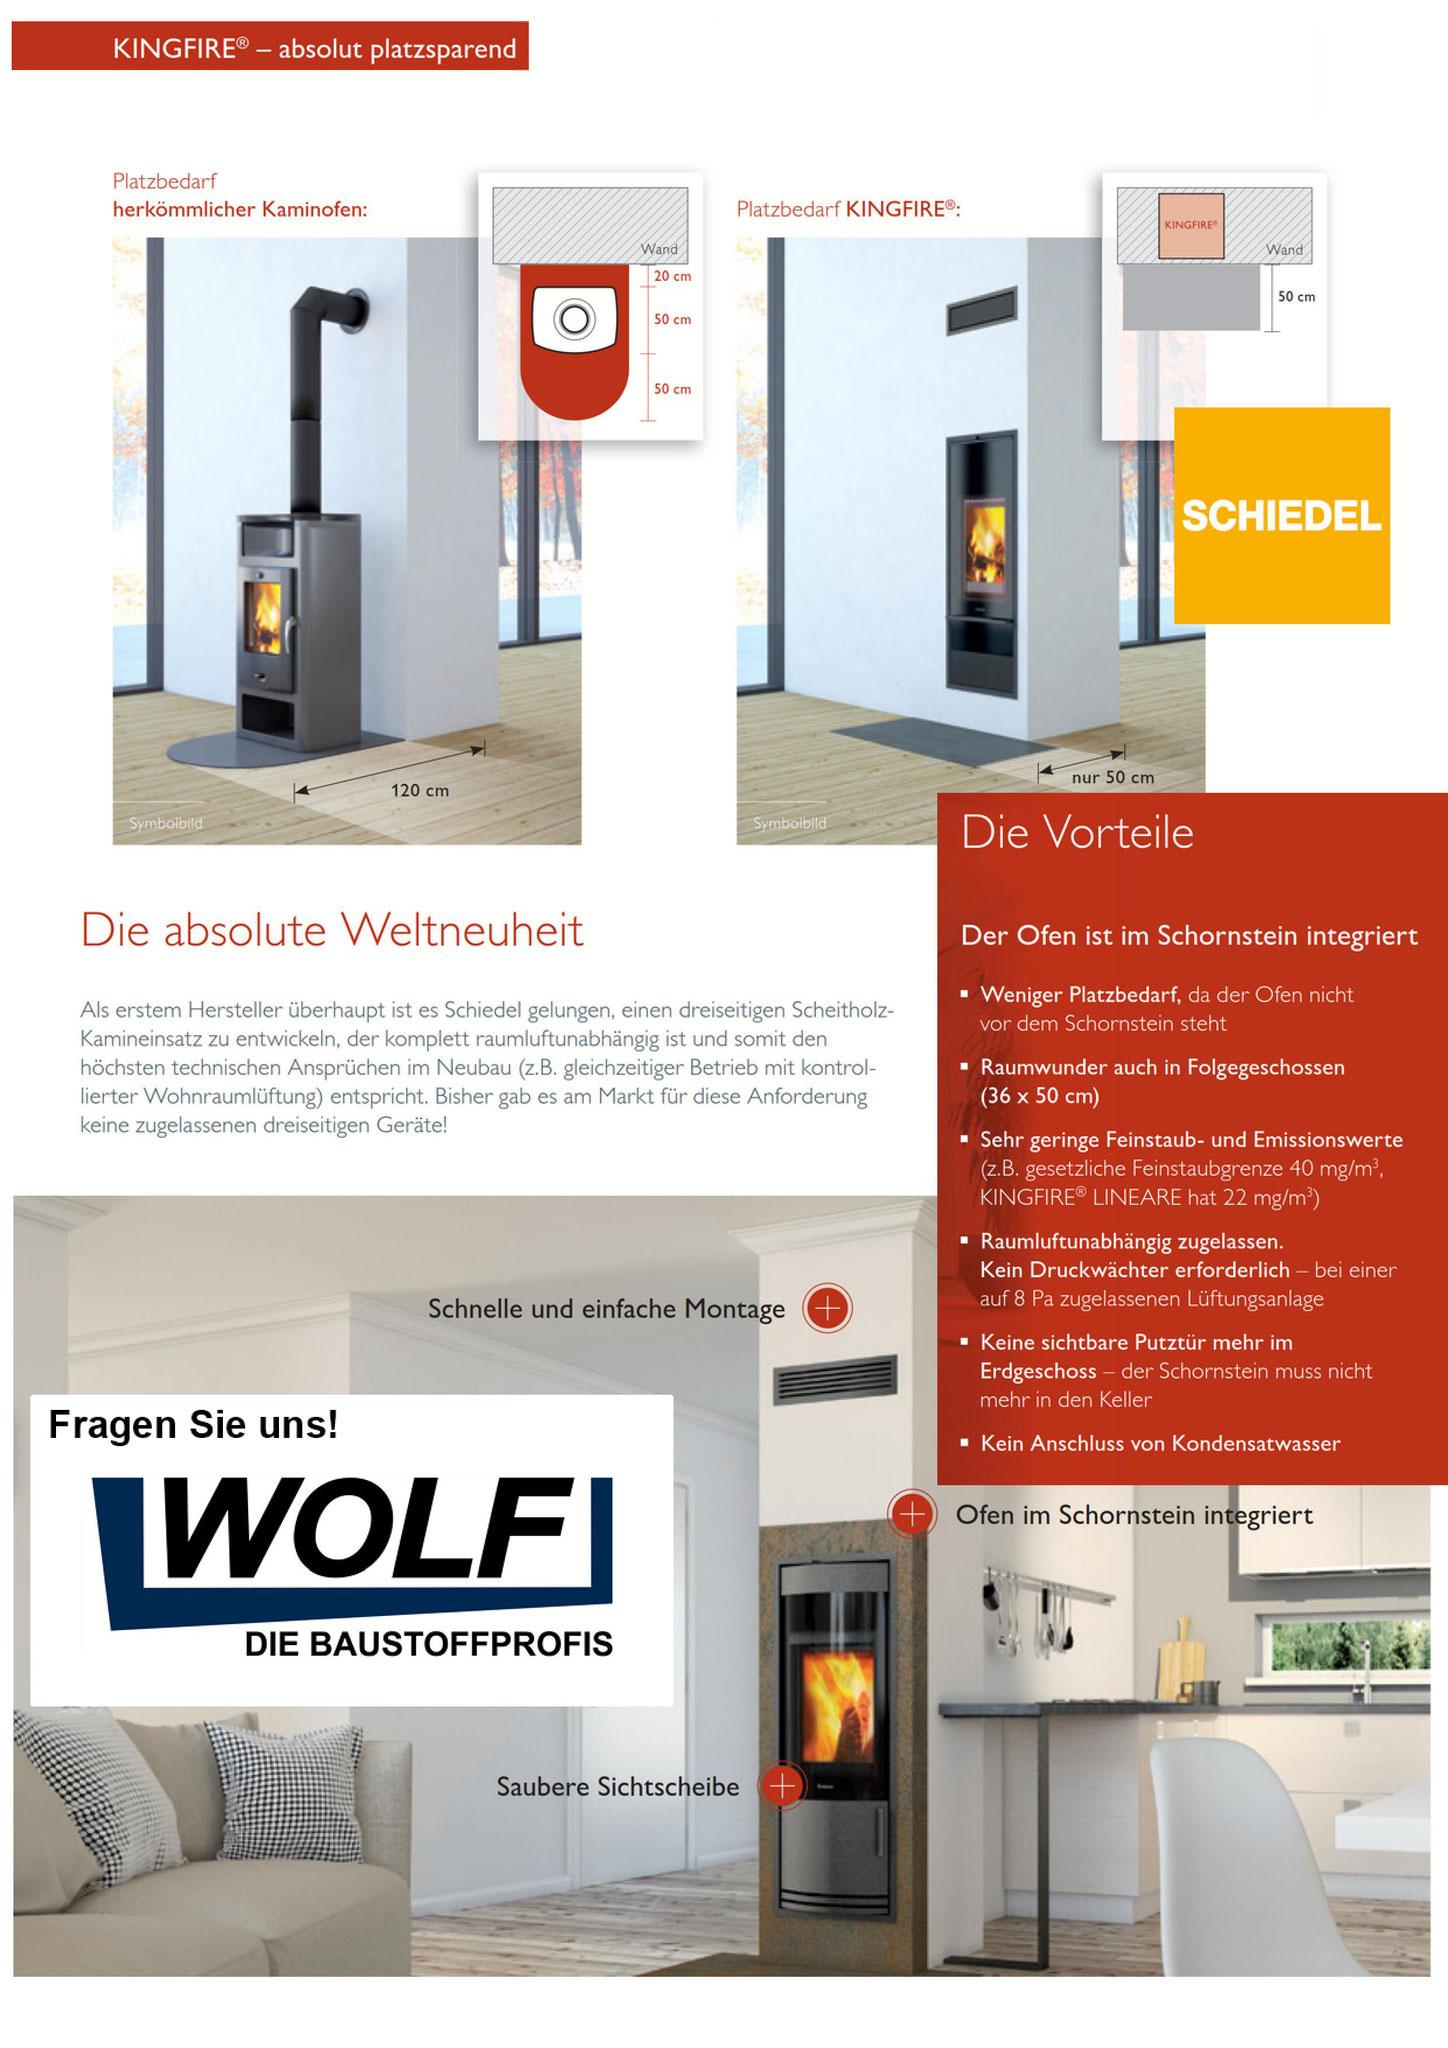 Fotos: Schiedel GmbH & Co. KG, München – www.schiedel.de